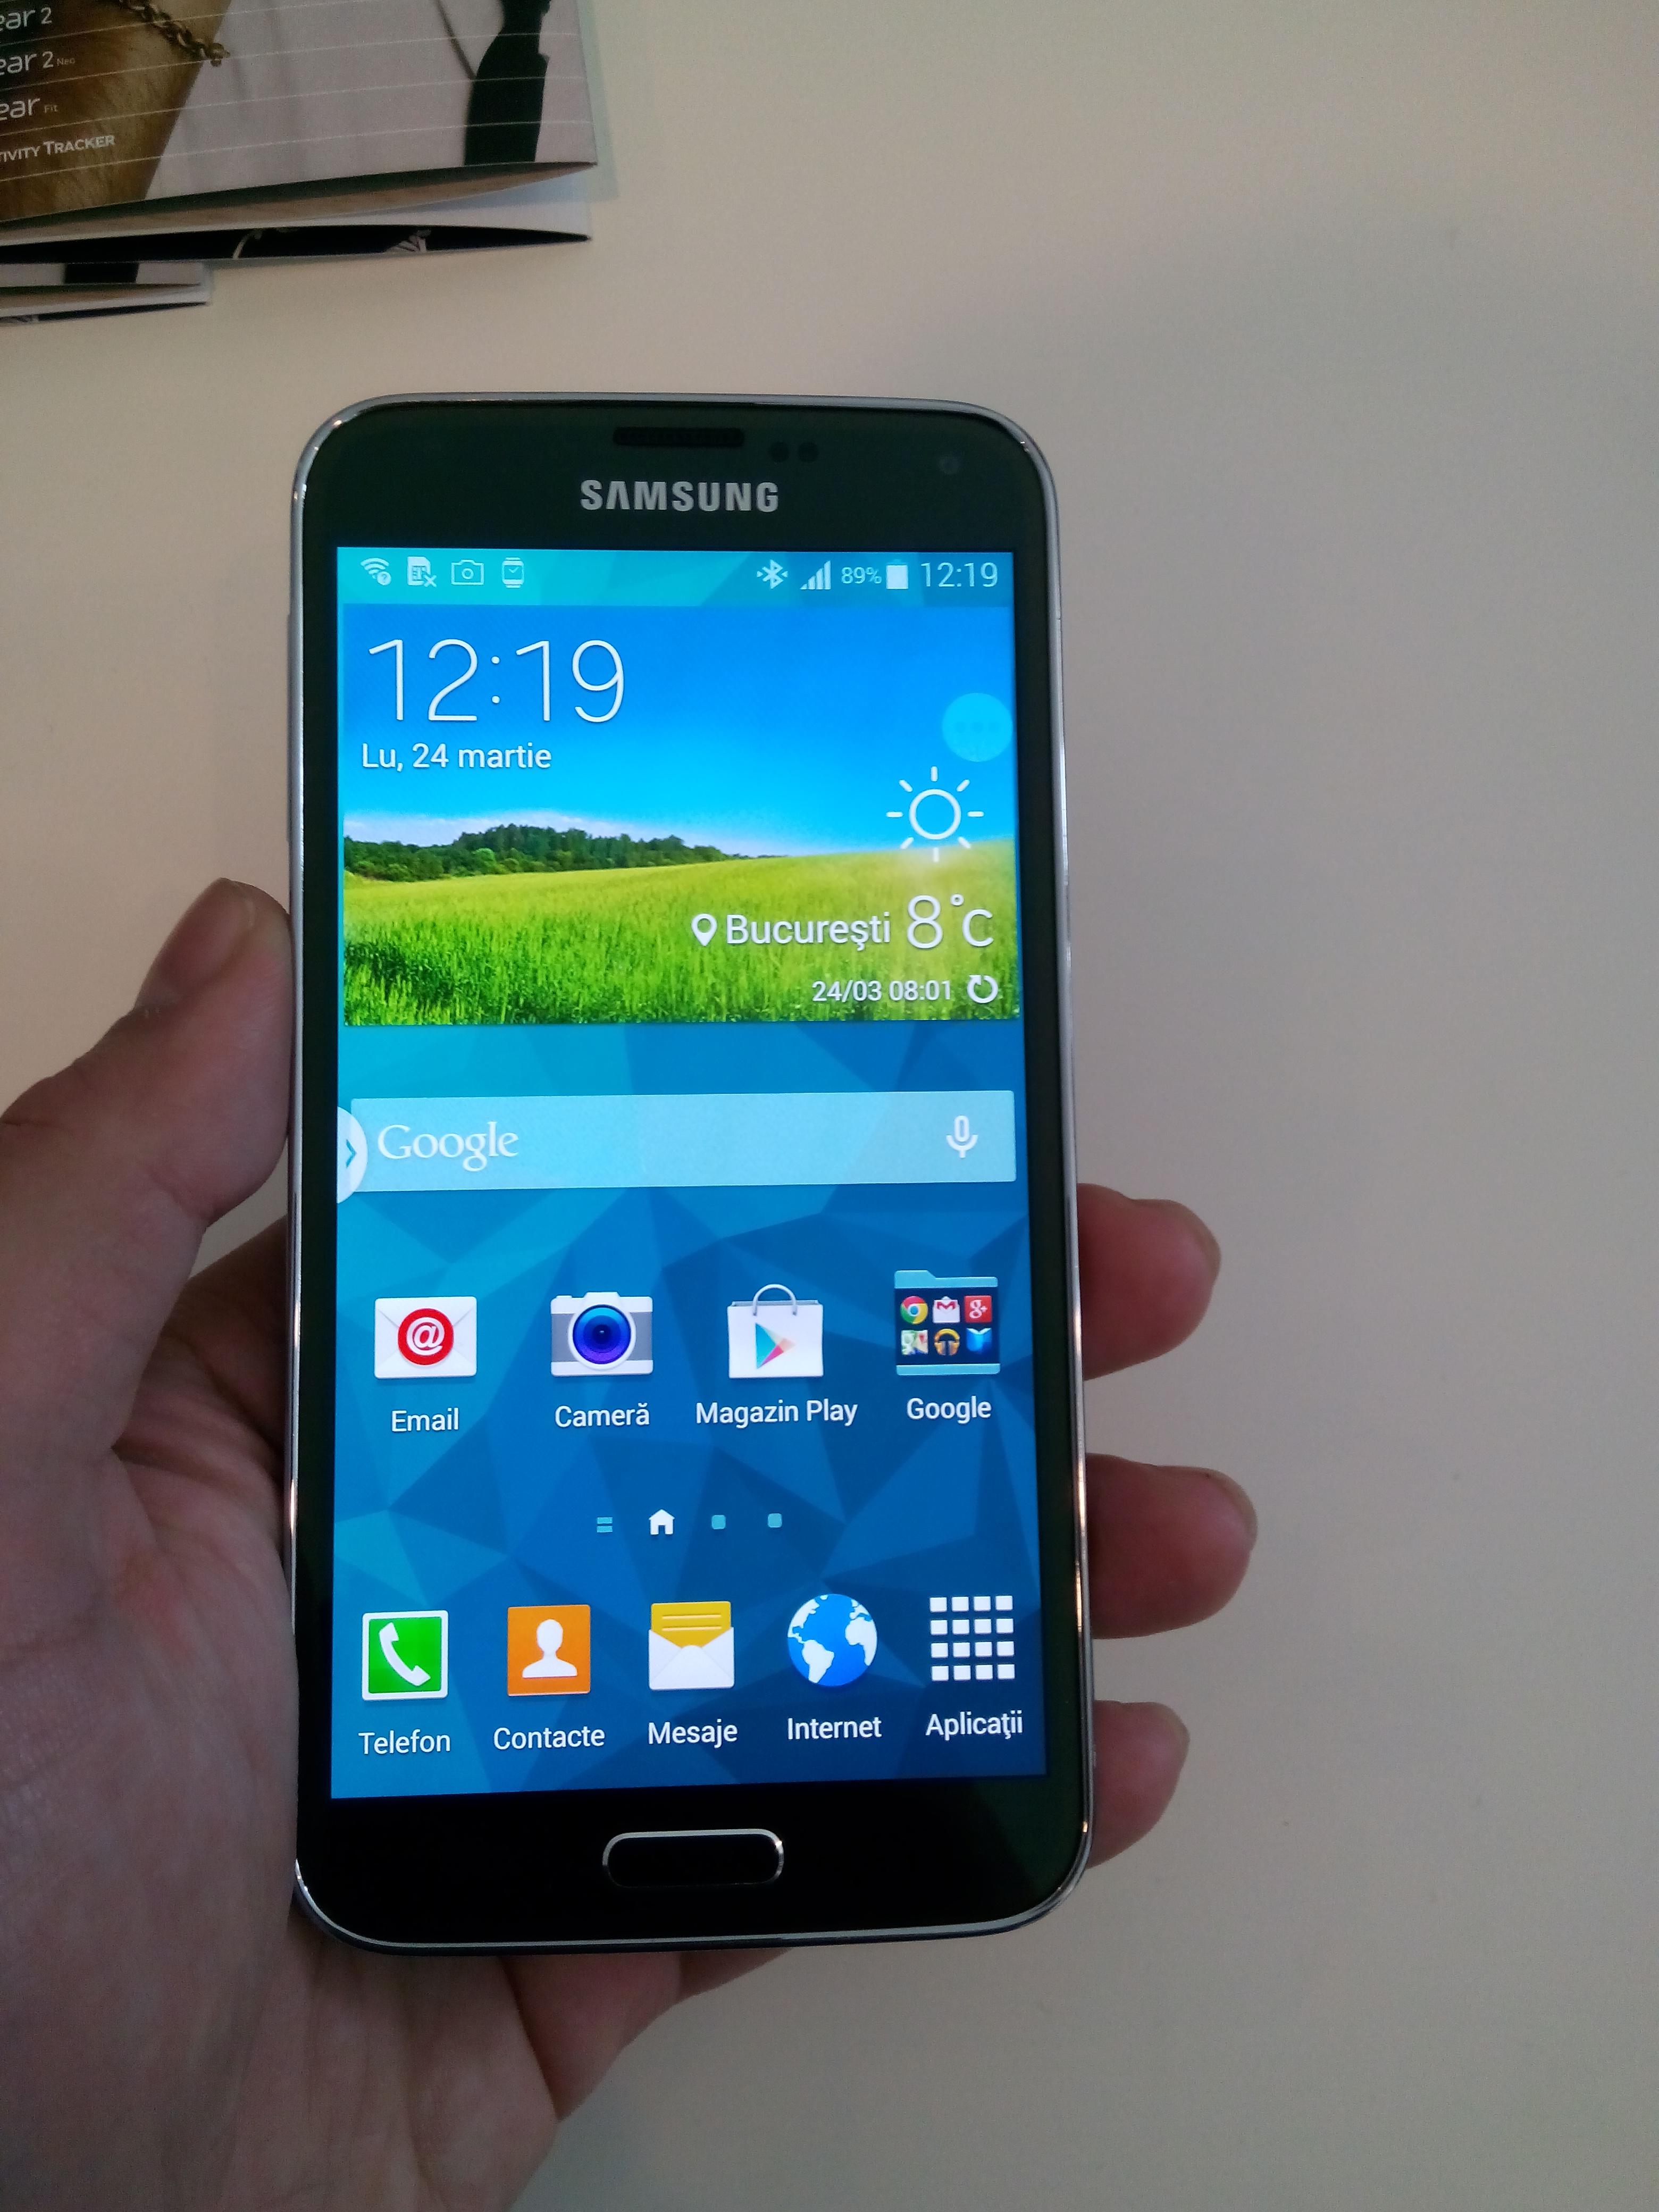 Samsung Galaxy S5: Hands-on